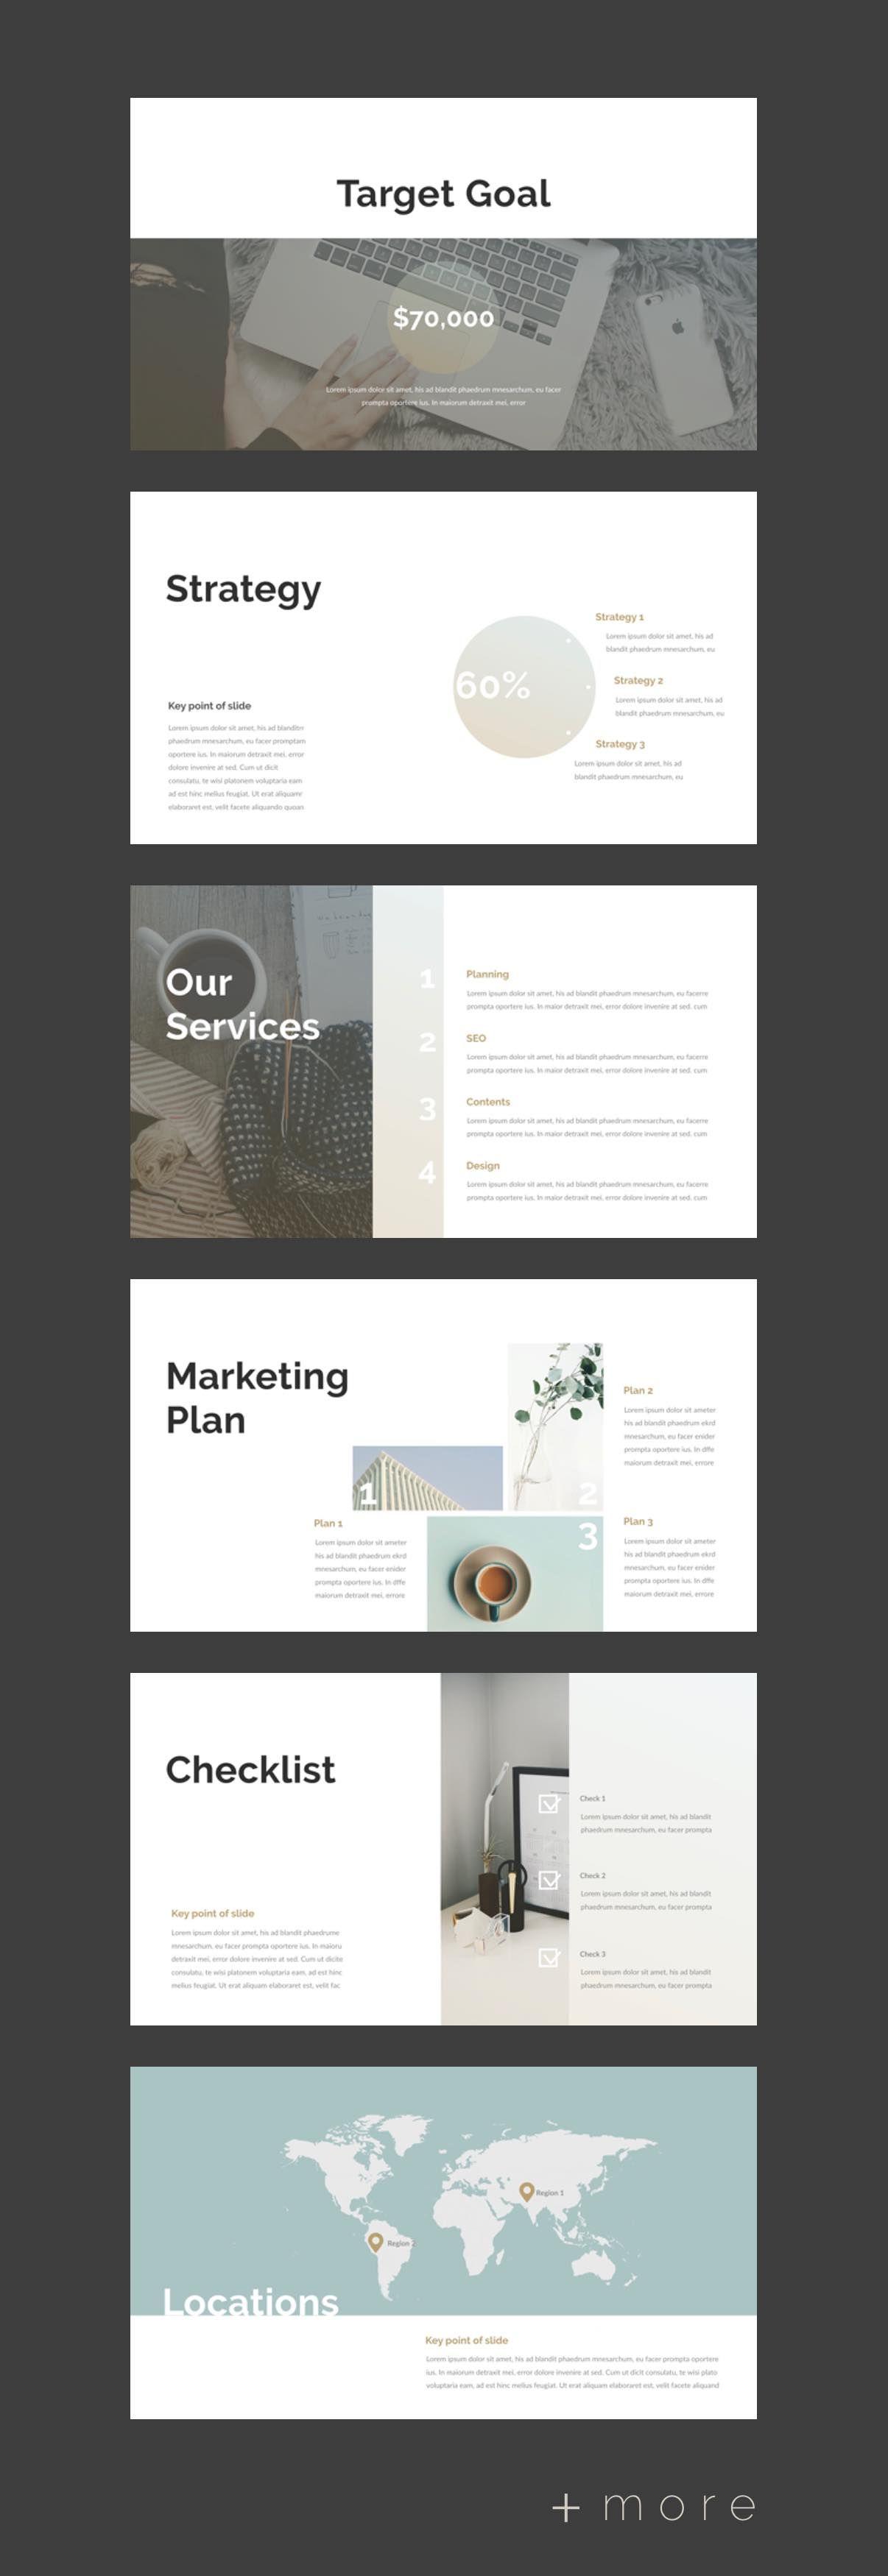 Planner PowerPoint Template 프레젠테이션 레이아웃, 프리젠테이션 양식, 디자인 웹사이트